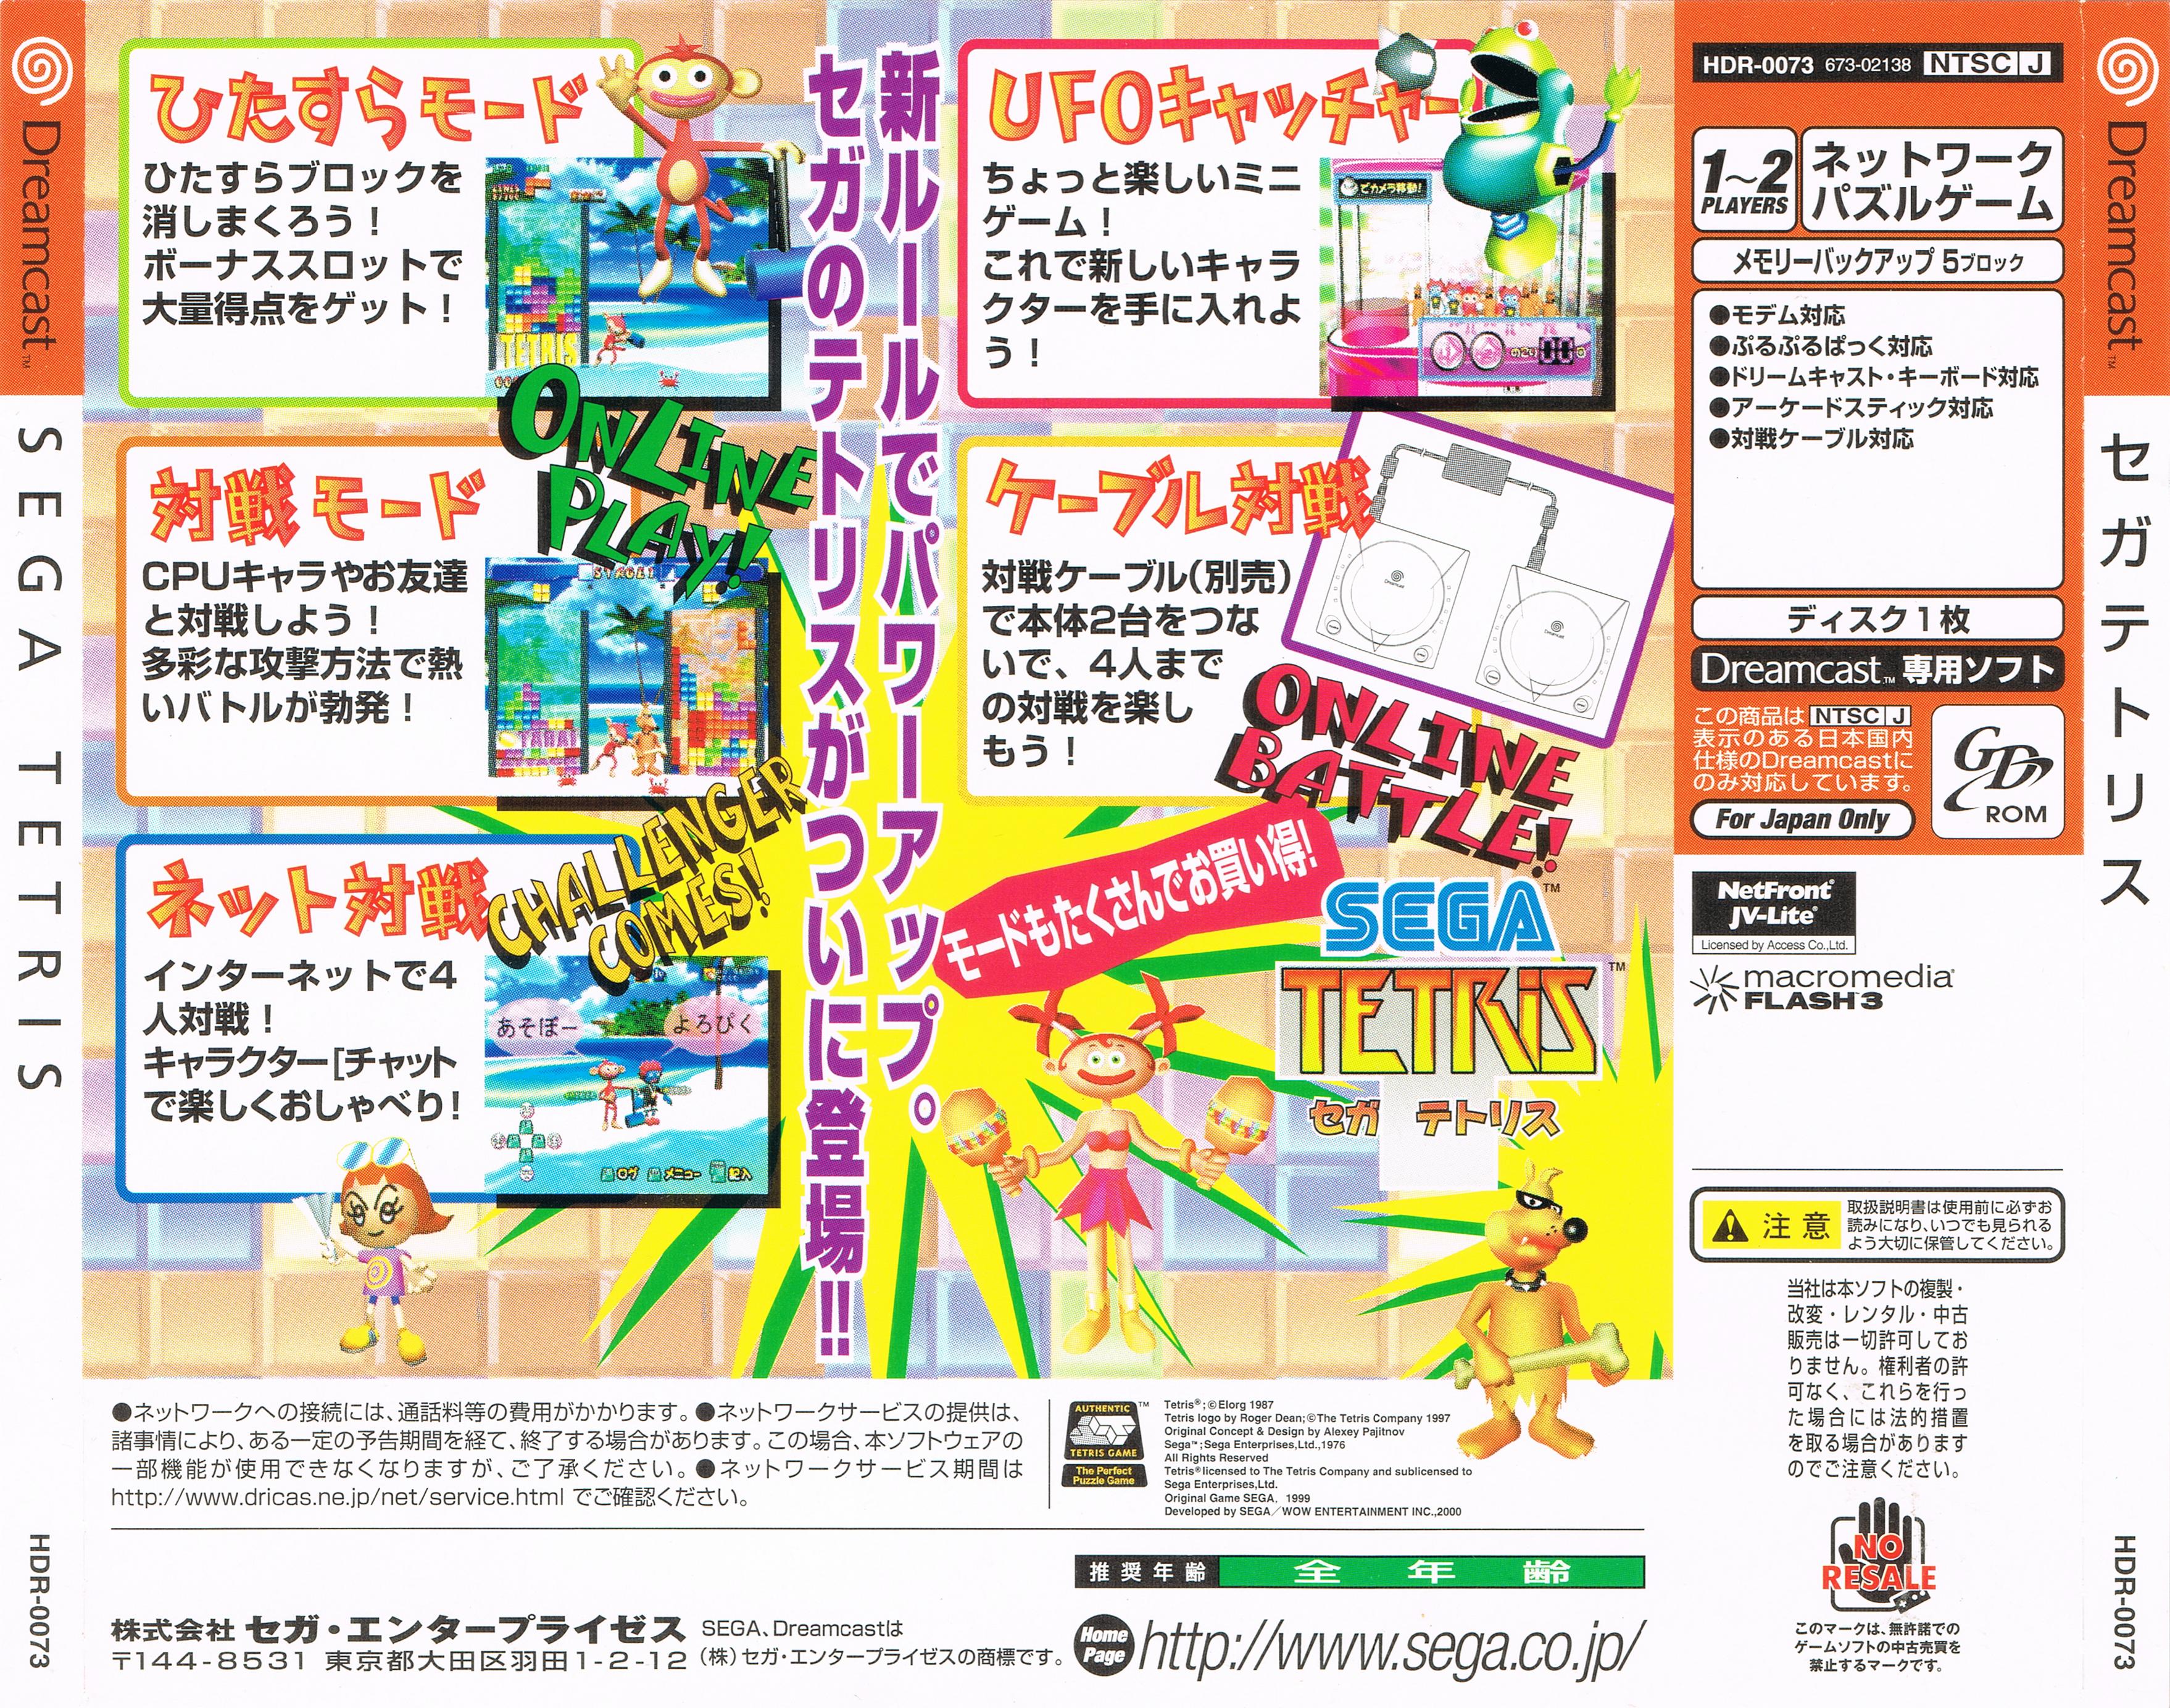 DREAMCAST) Sega Tetris (NTSC-J)(CDI + GDI)